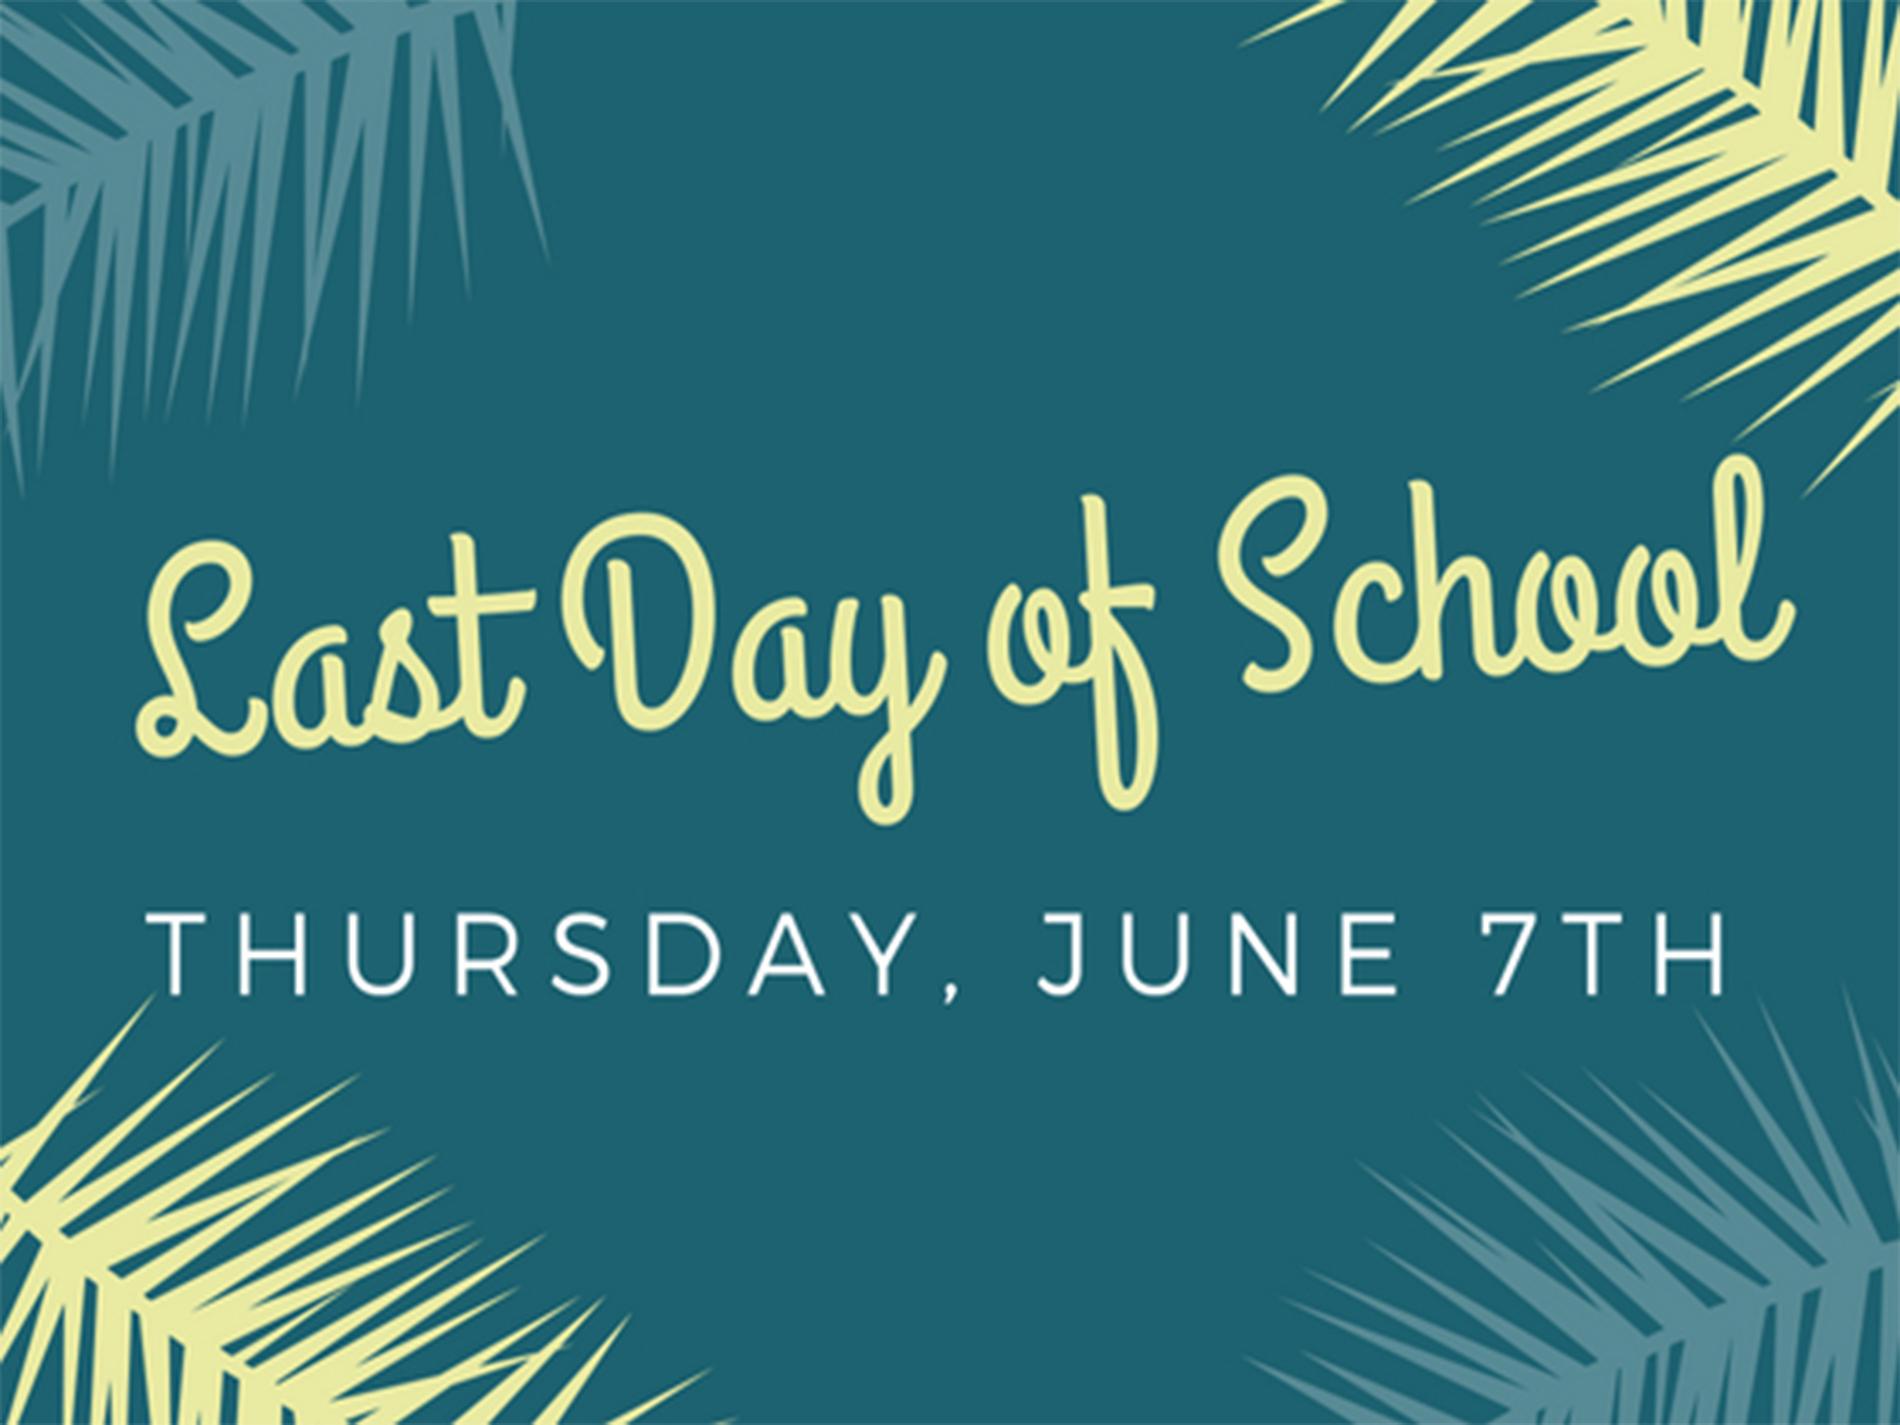 SECONDARY-Last-day-of-School.jpg